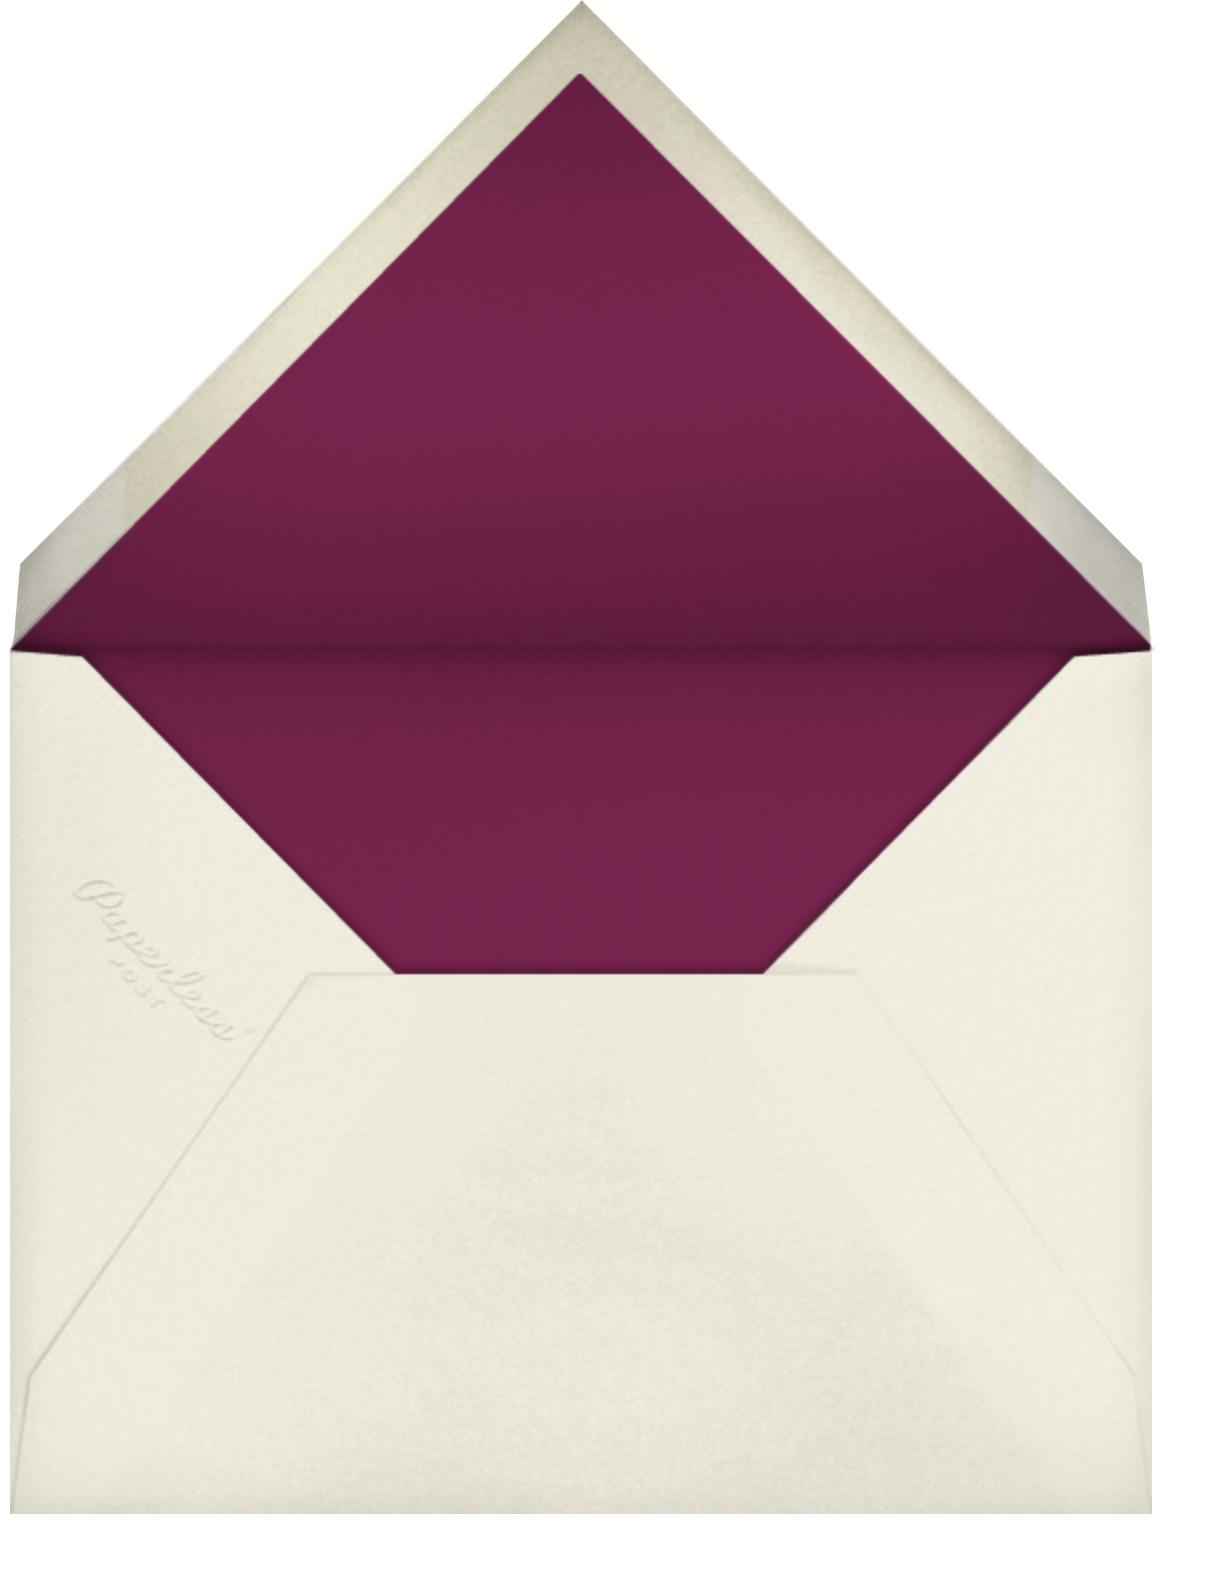 Ballet Birthday (Yelena Bryksenkova) - Light - Red Cap Cards - Envelope